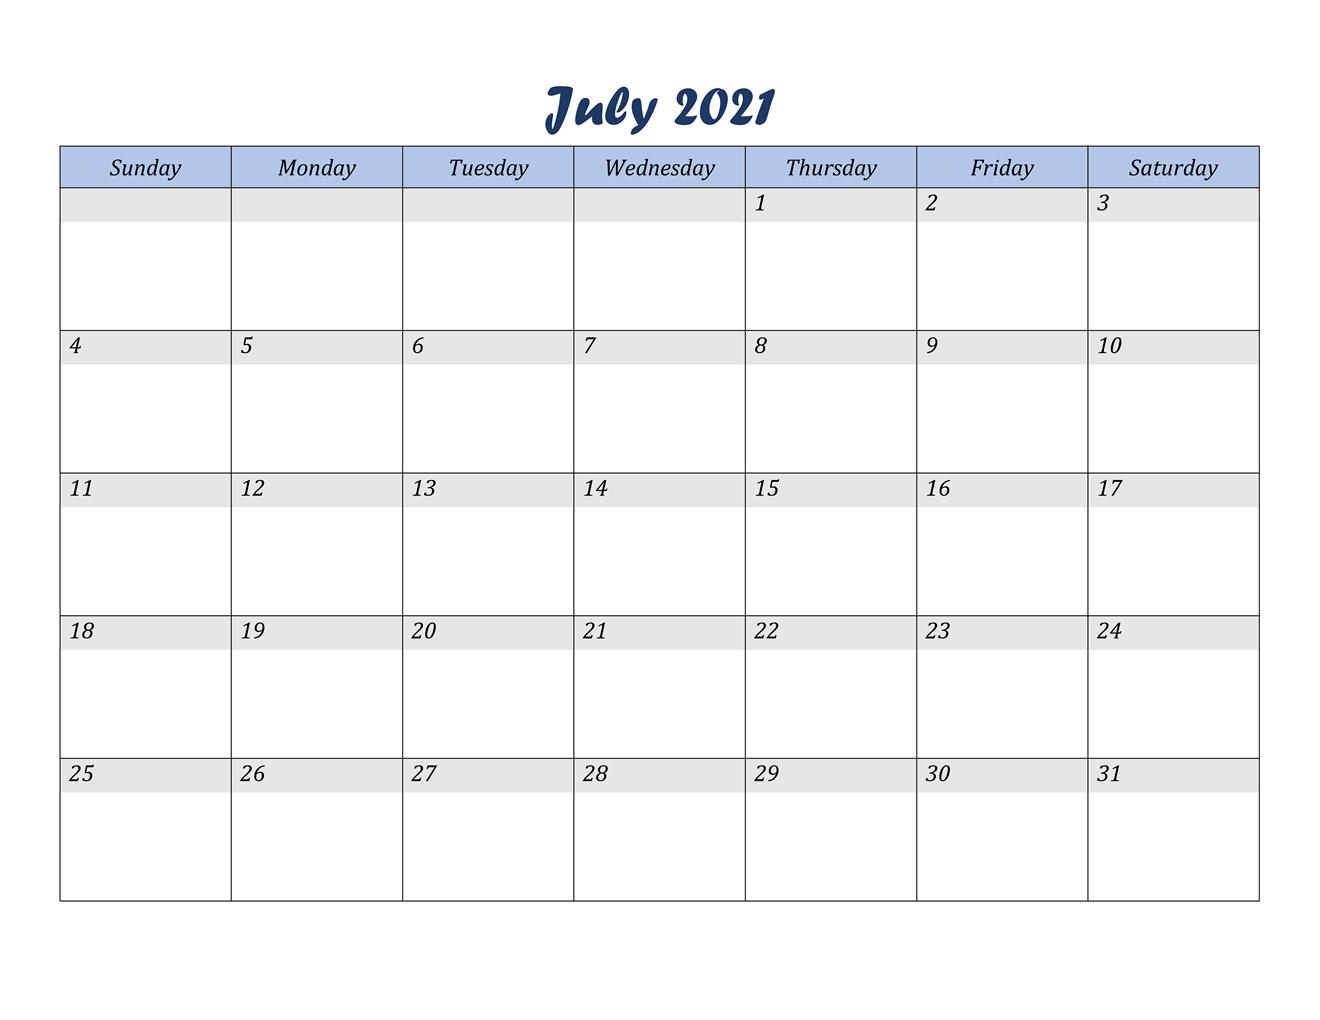 July 2021 Calendar Editable Template